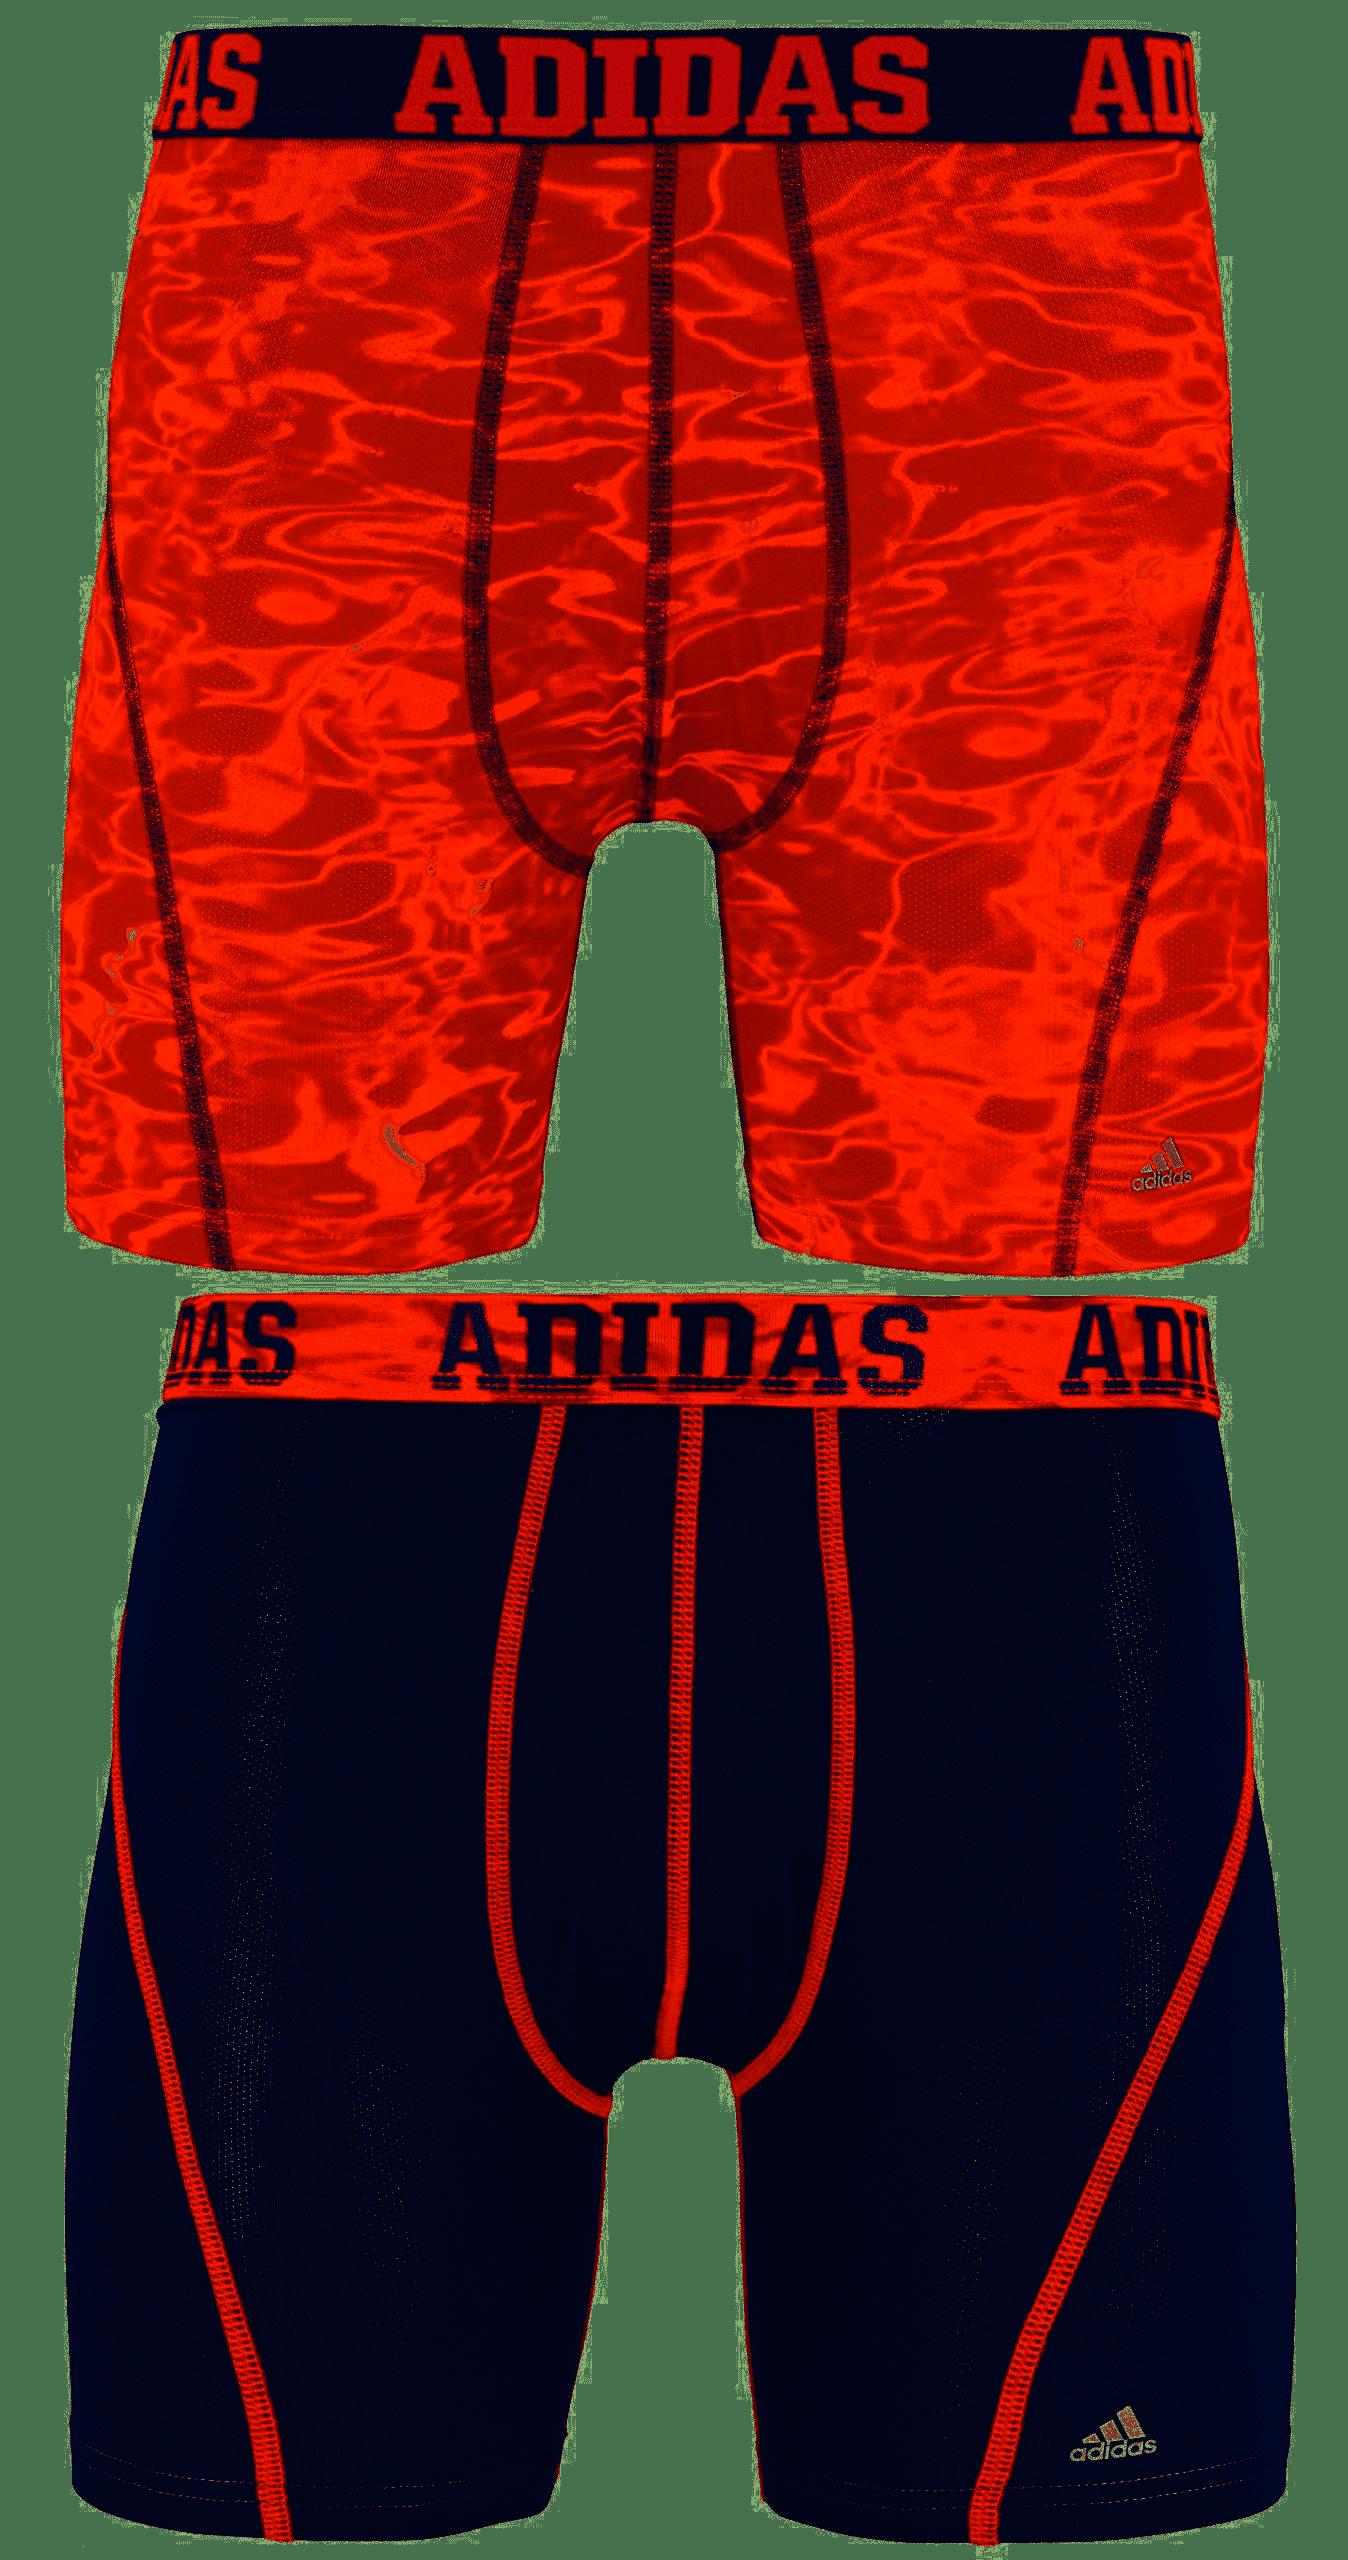 Adidas - ADIDAS MEN'S UNDERWEAR BOXER BRIEF - ORANGE GREY - MEDIUM - 2 PACK - CLIMACOOL - Walmart.com